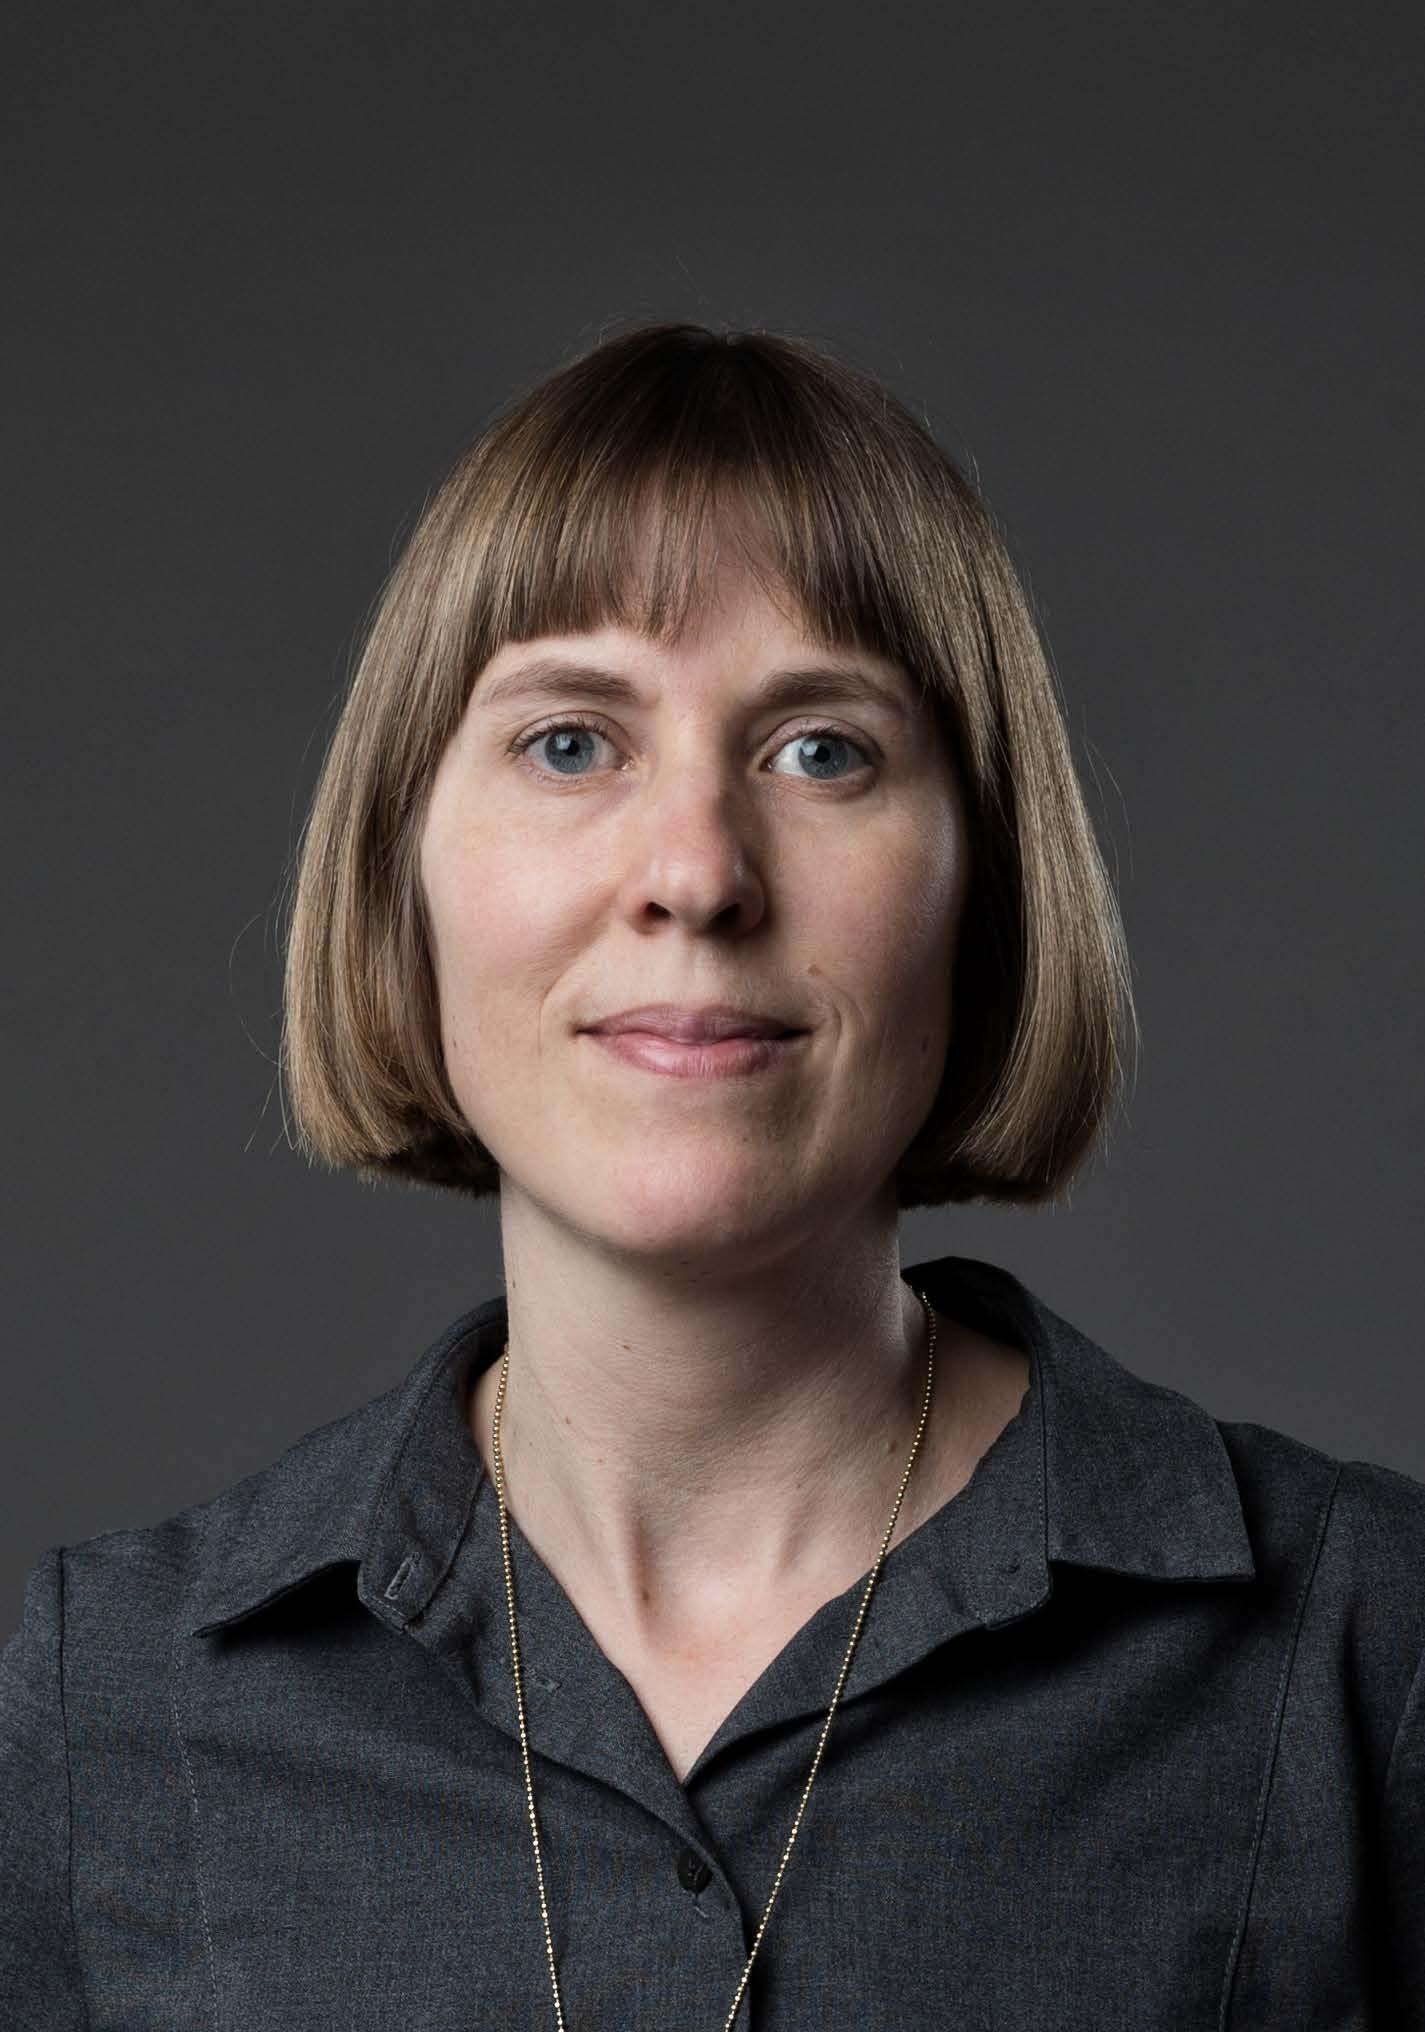 Anne Skorkjær Binderkrantz